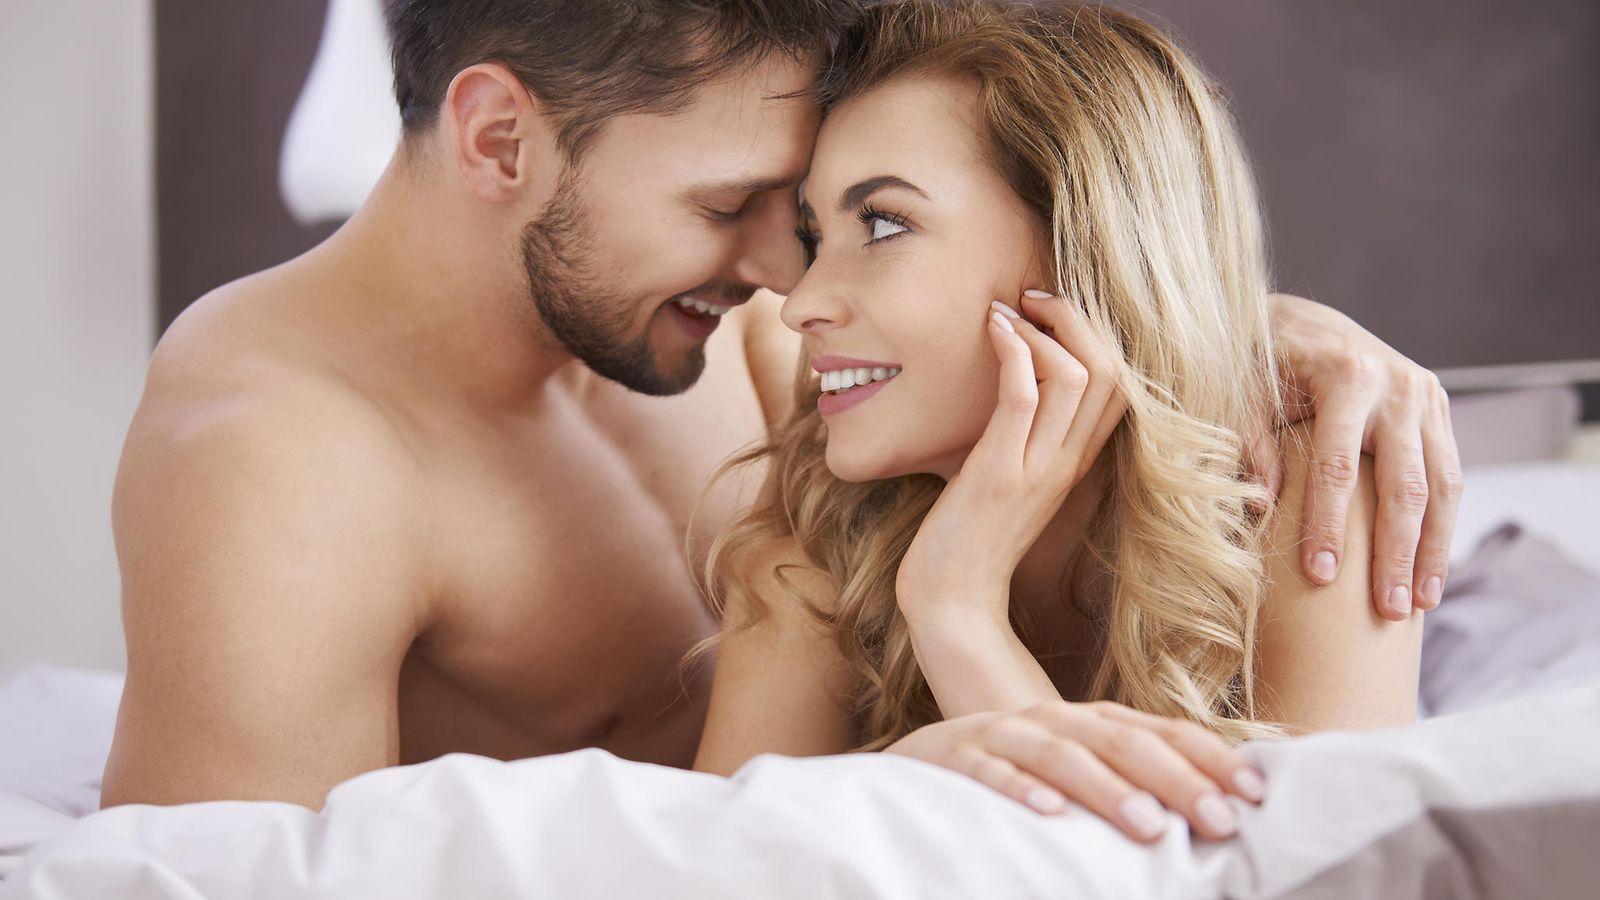 homo dating vaikeudet